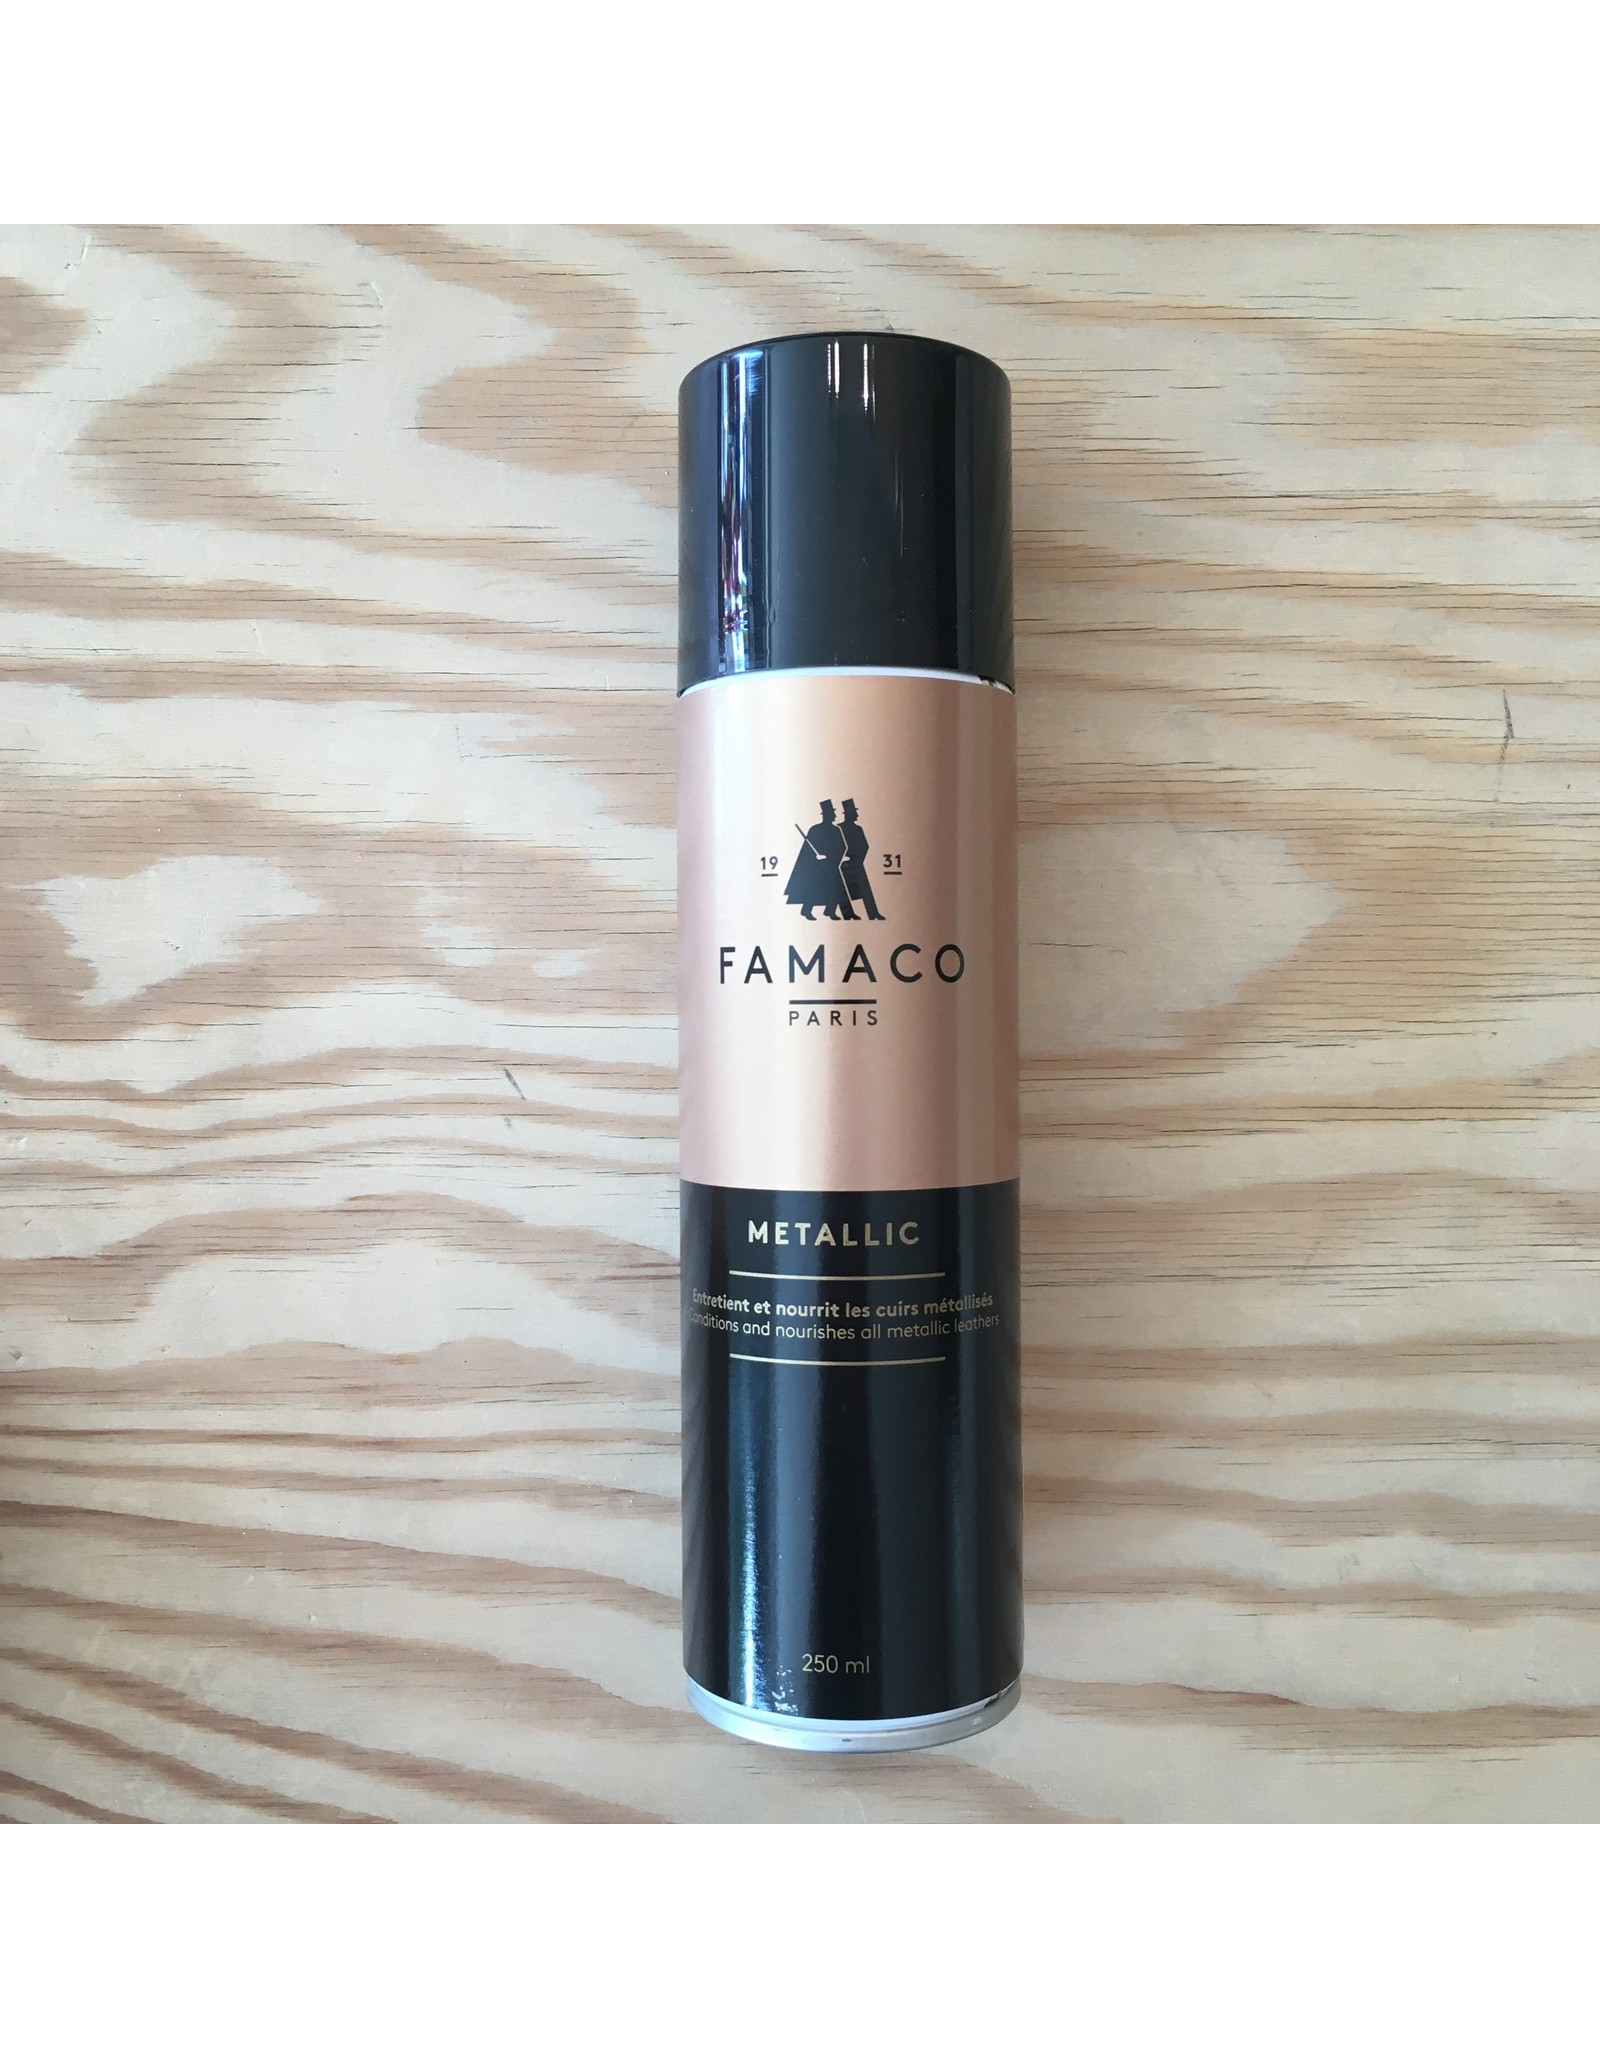 FAMACO FAMACO METALLIC SPRAY 250ml